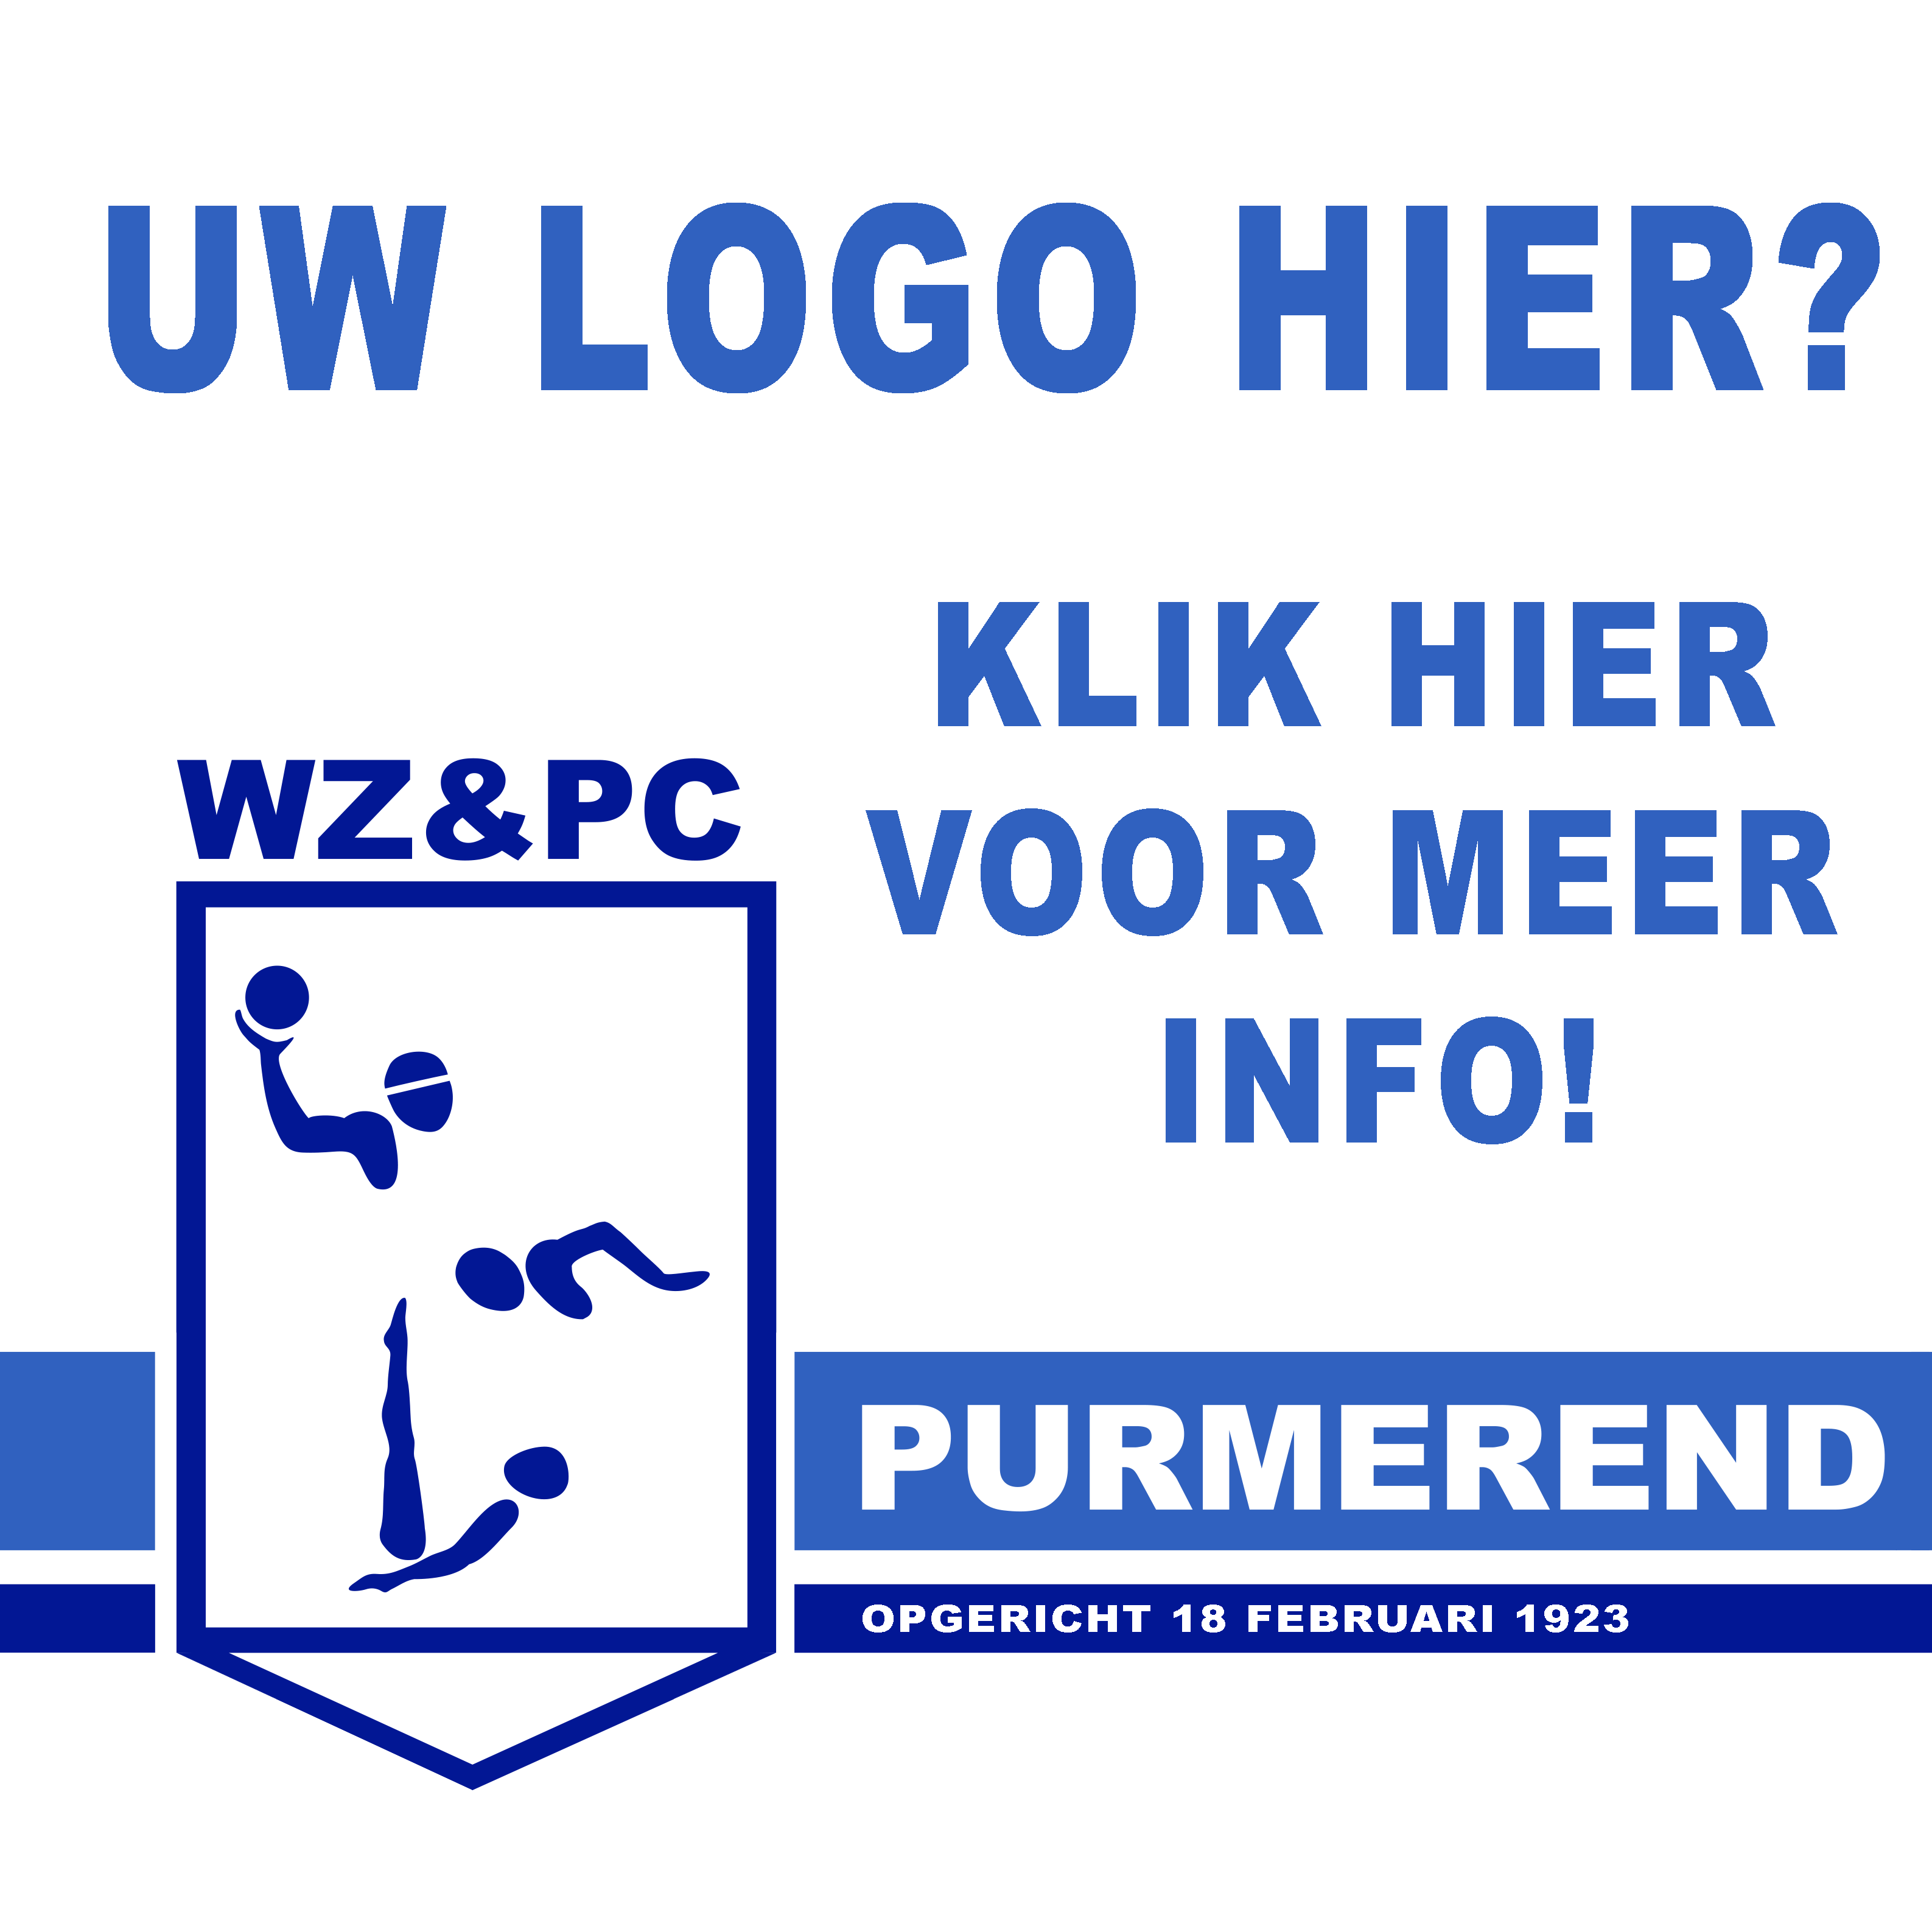 https://wzpc.nl/wp-content/uploads/2020/01/Logo-hier.png